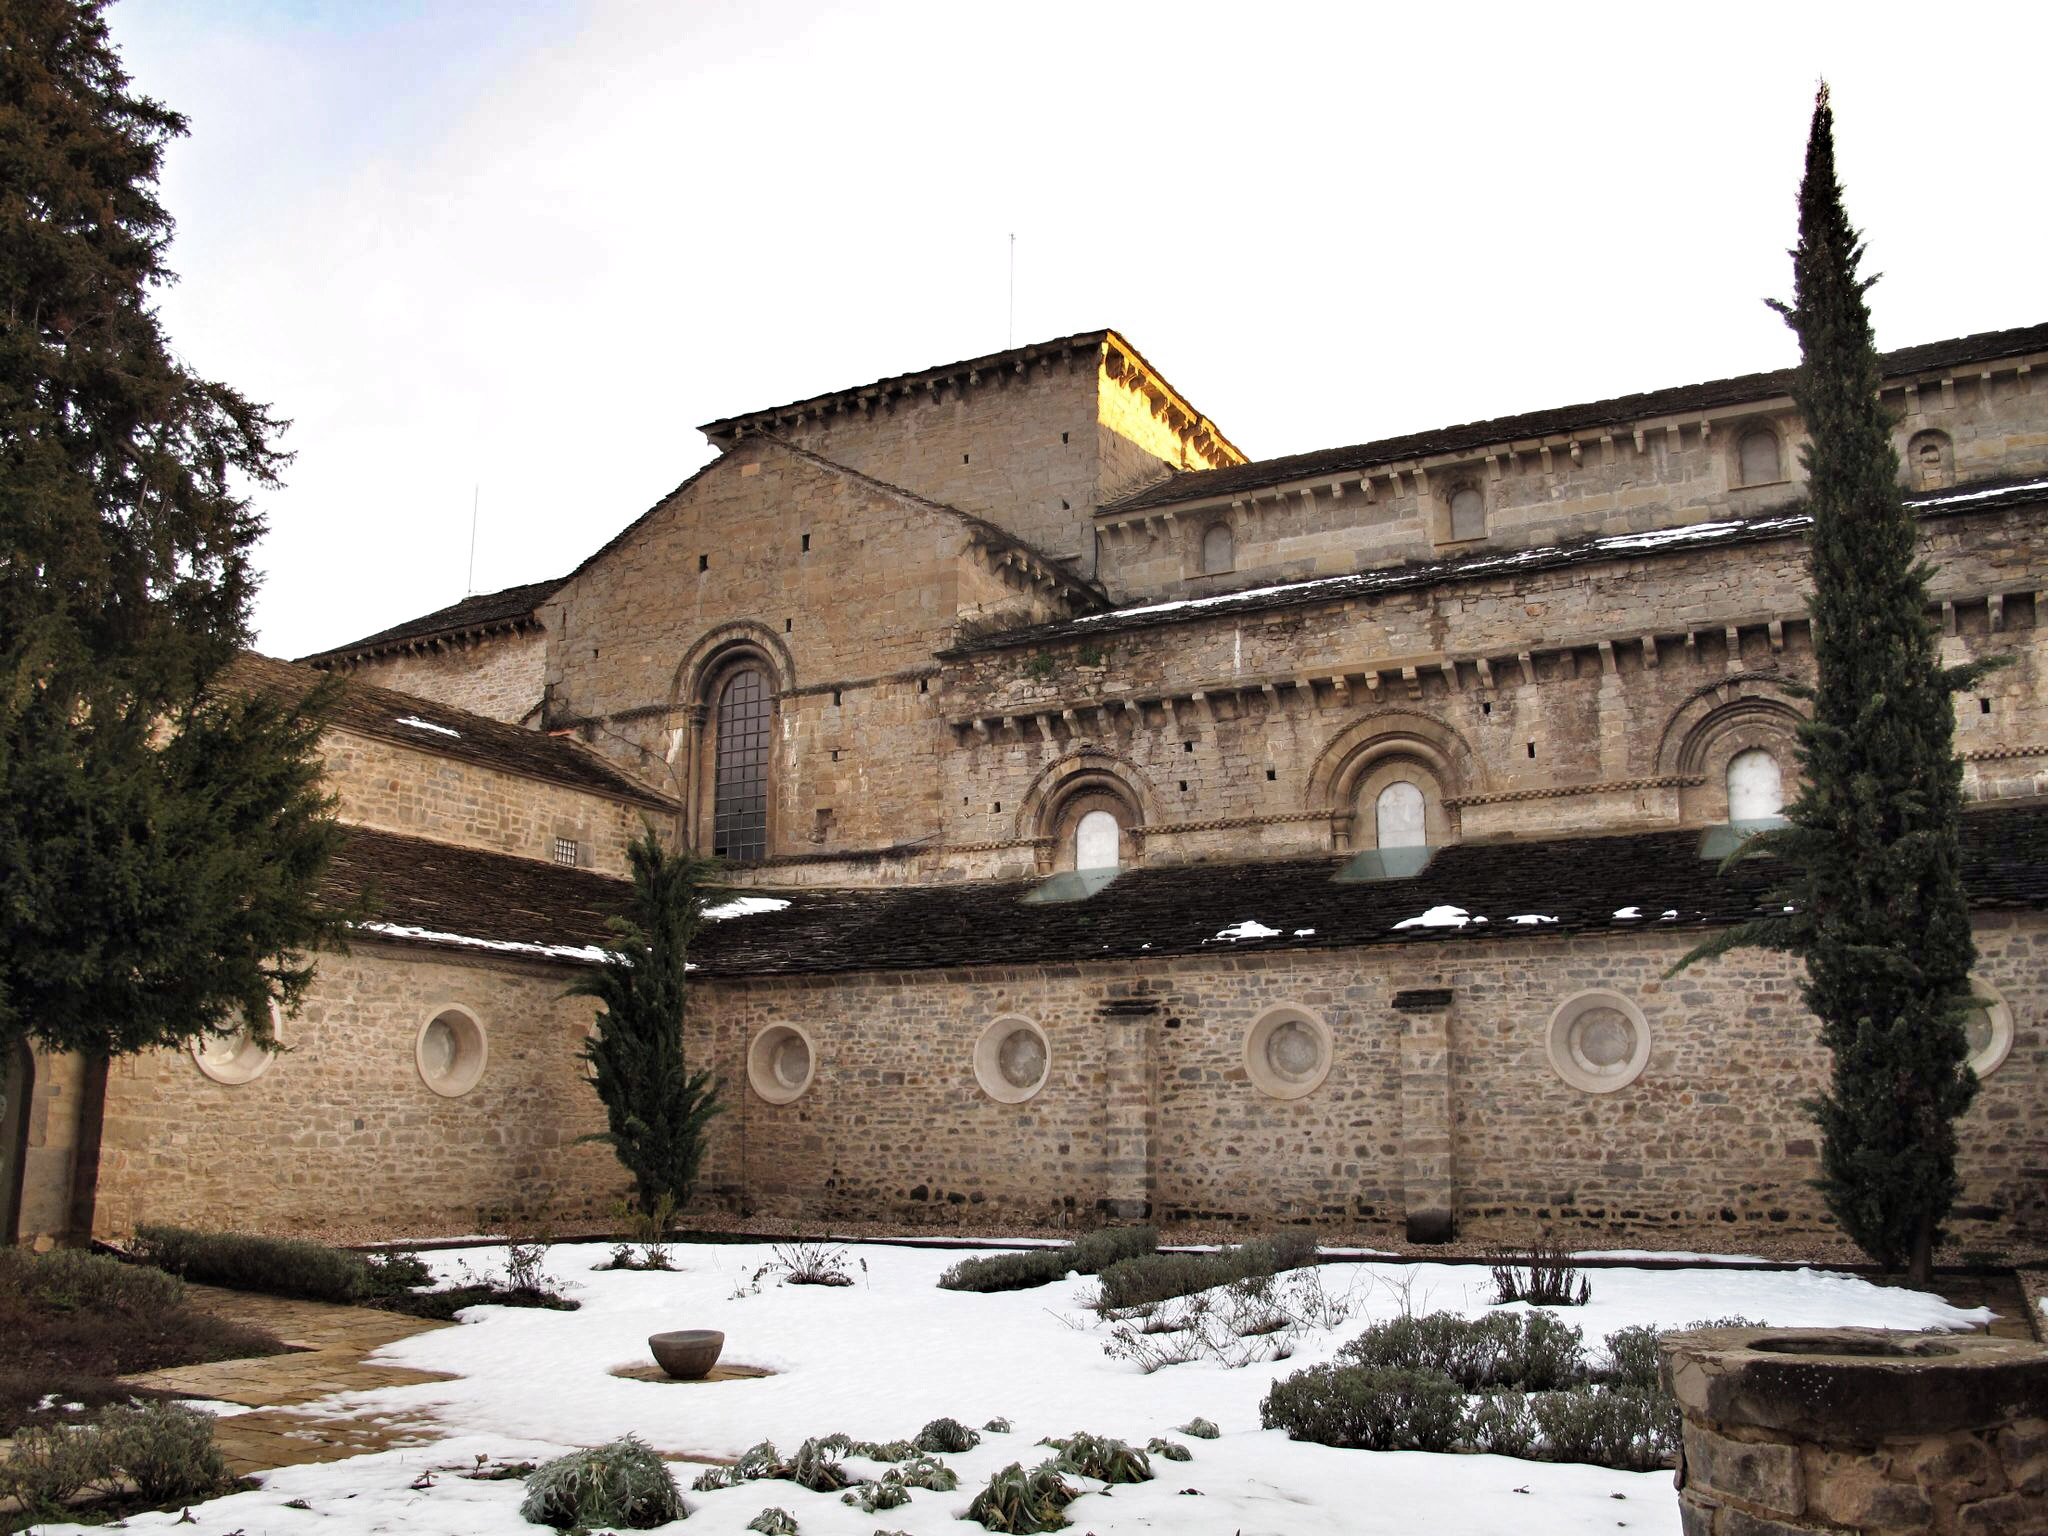 reharq_catedral _museo diocesano de jaca